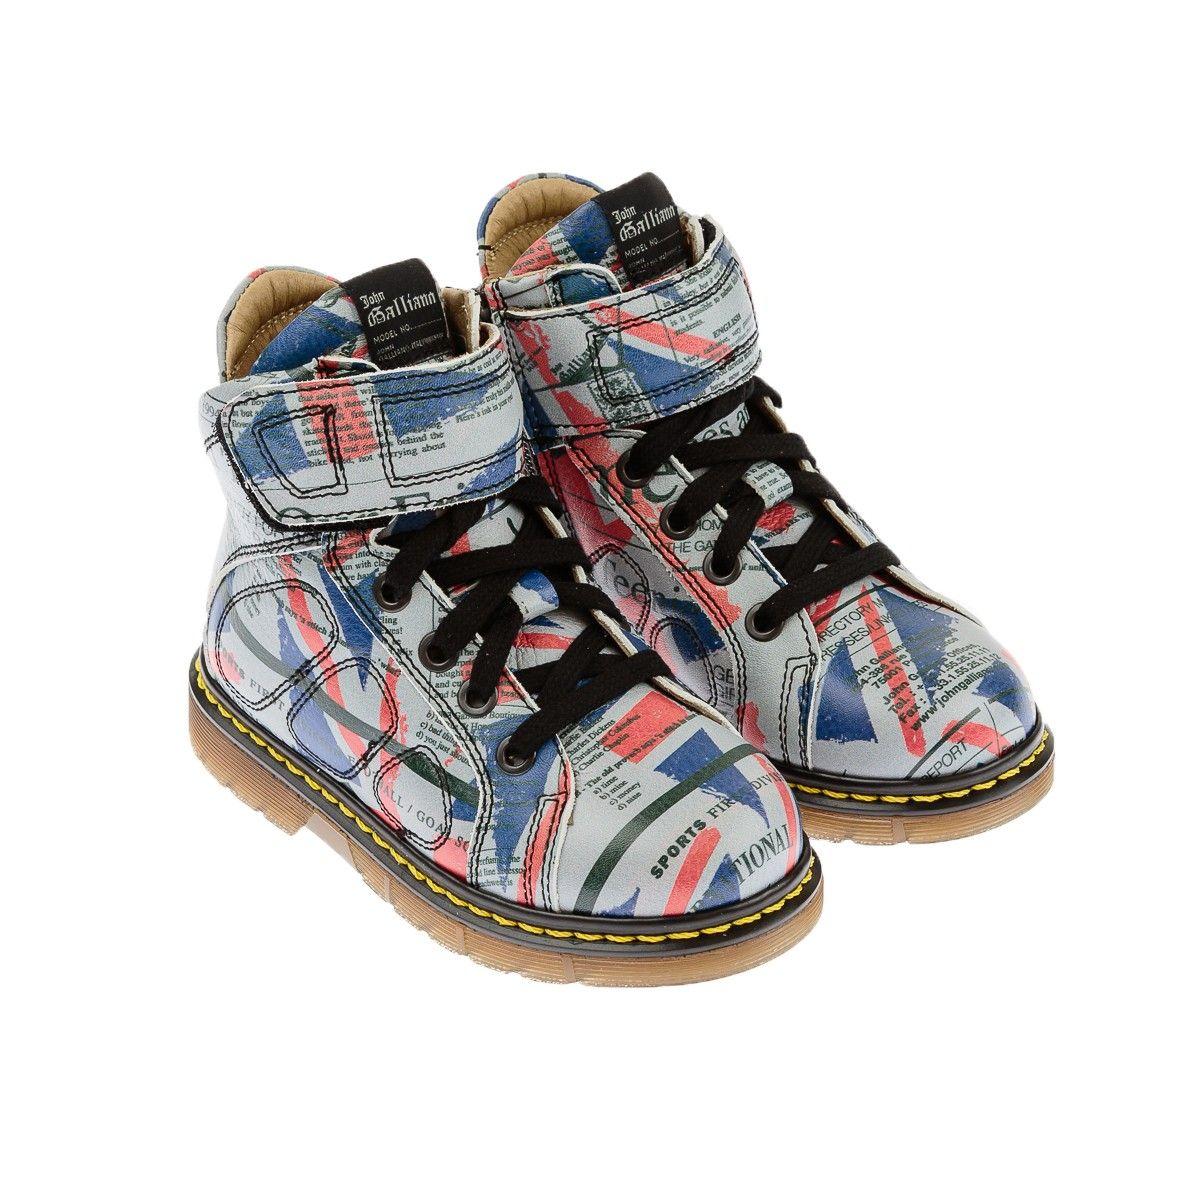 John Galliano Boys Leather Union Jack Gazette Boots Kids Shoes Boots Leather